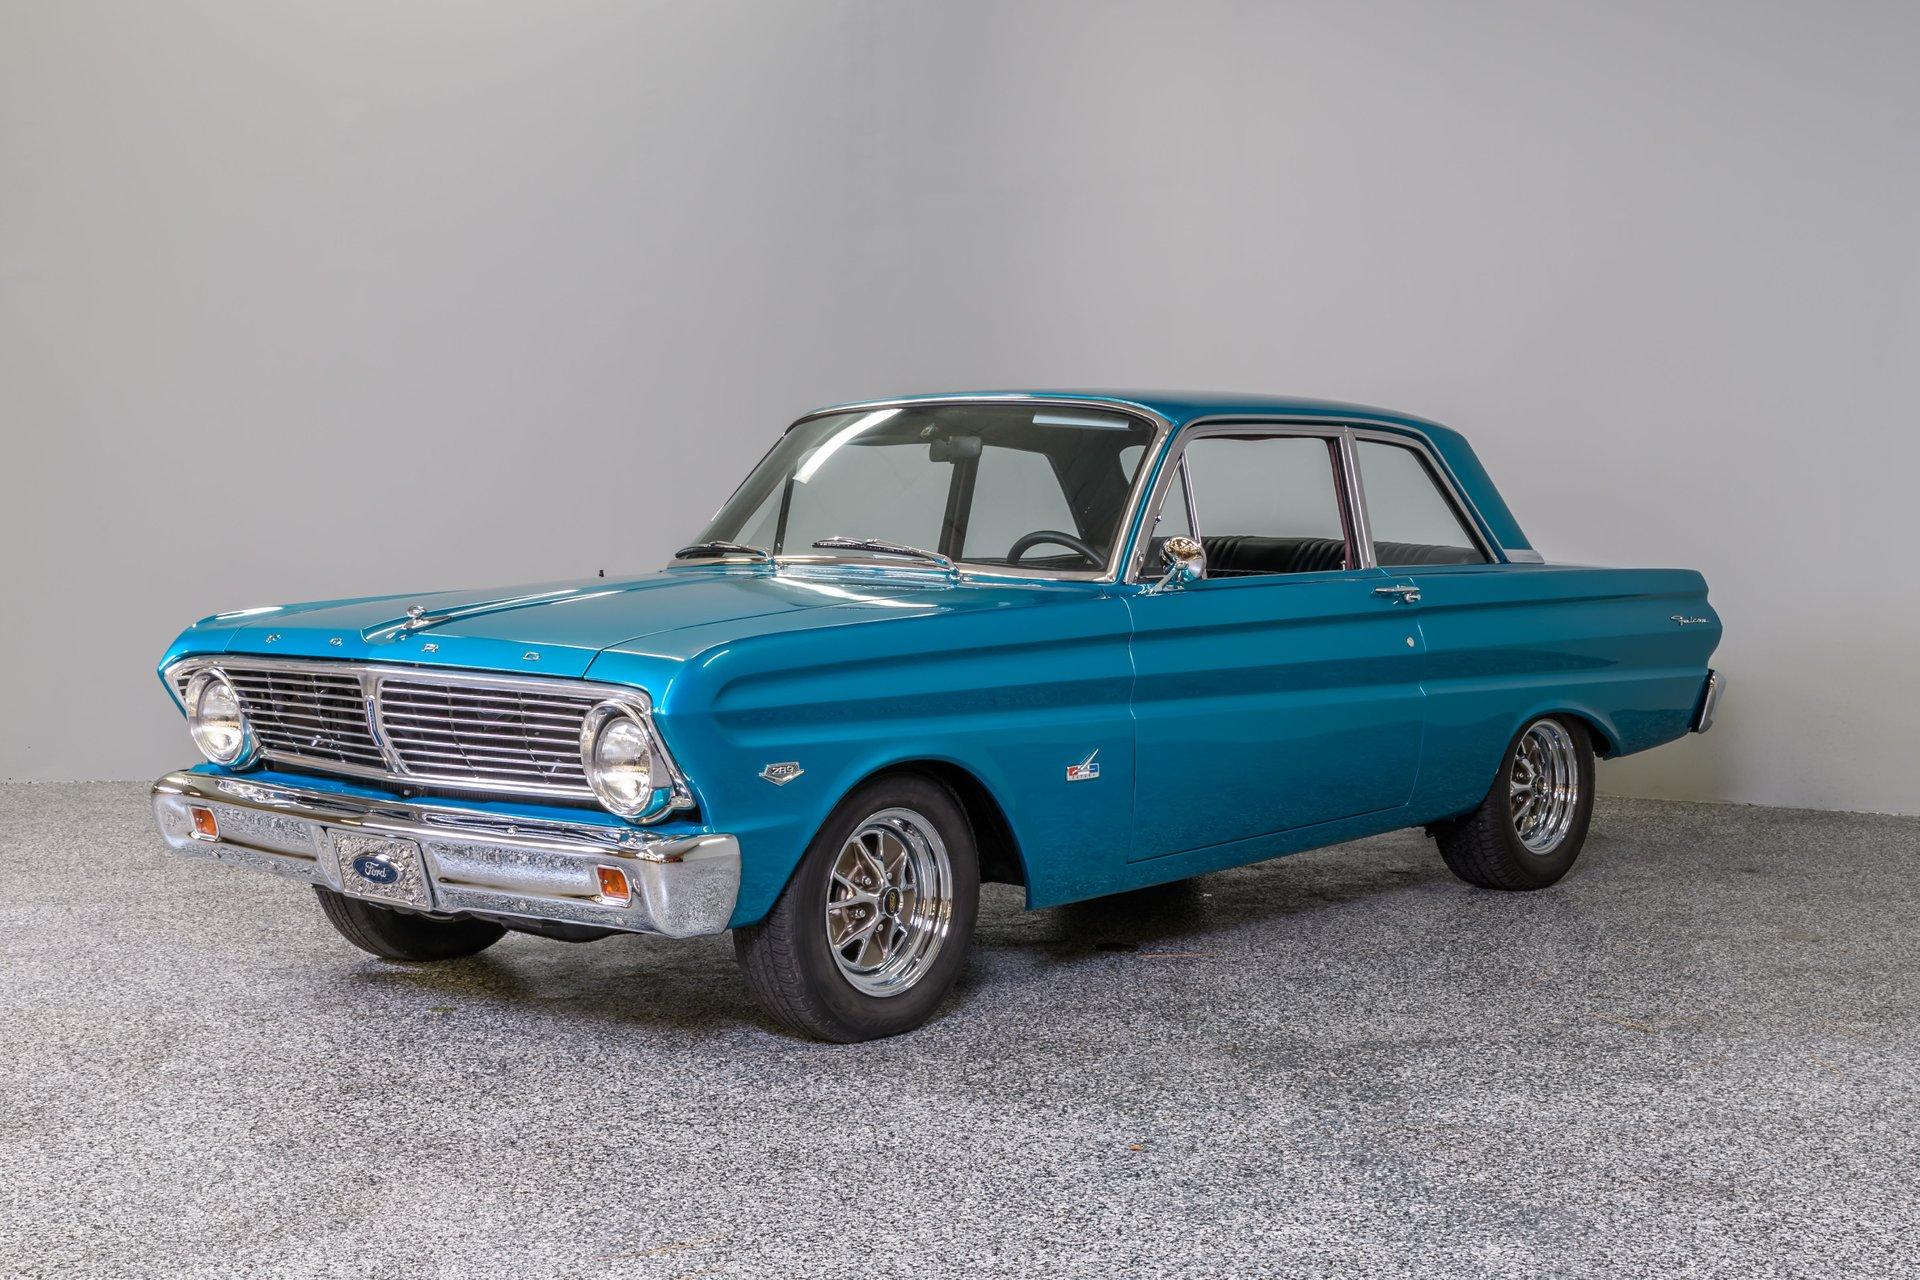 1965 Ford Falcon Futura for sale #1601 | Motorious